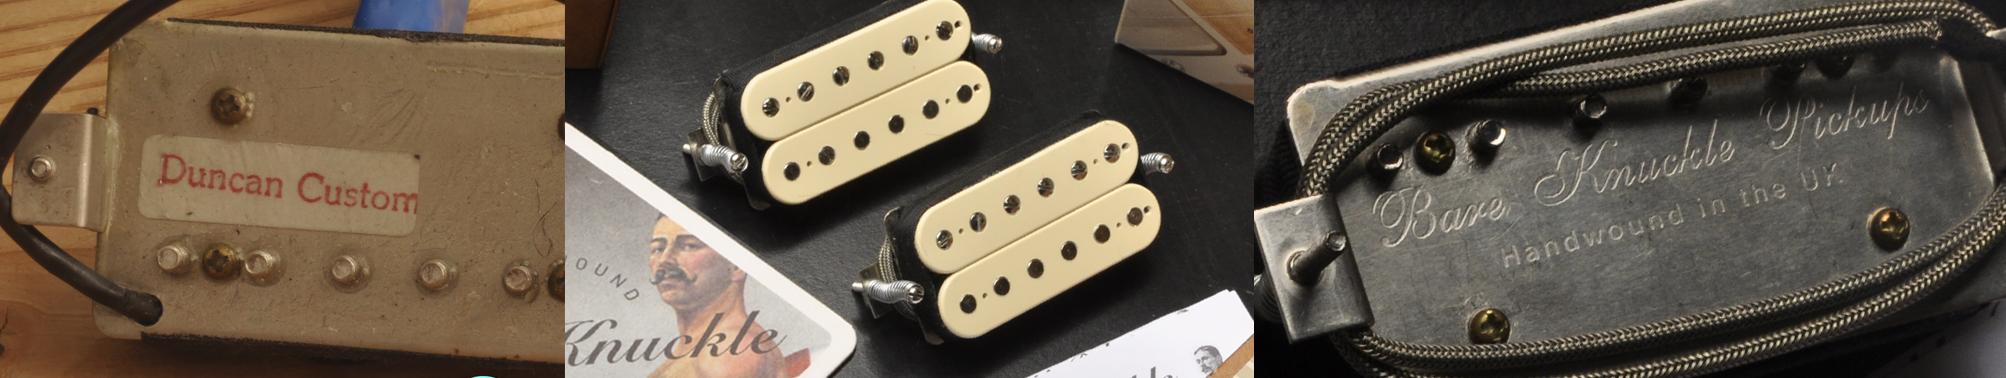 pickups-axn-guitars.jpg